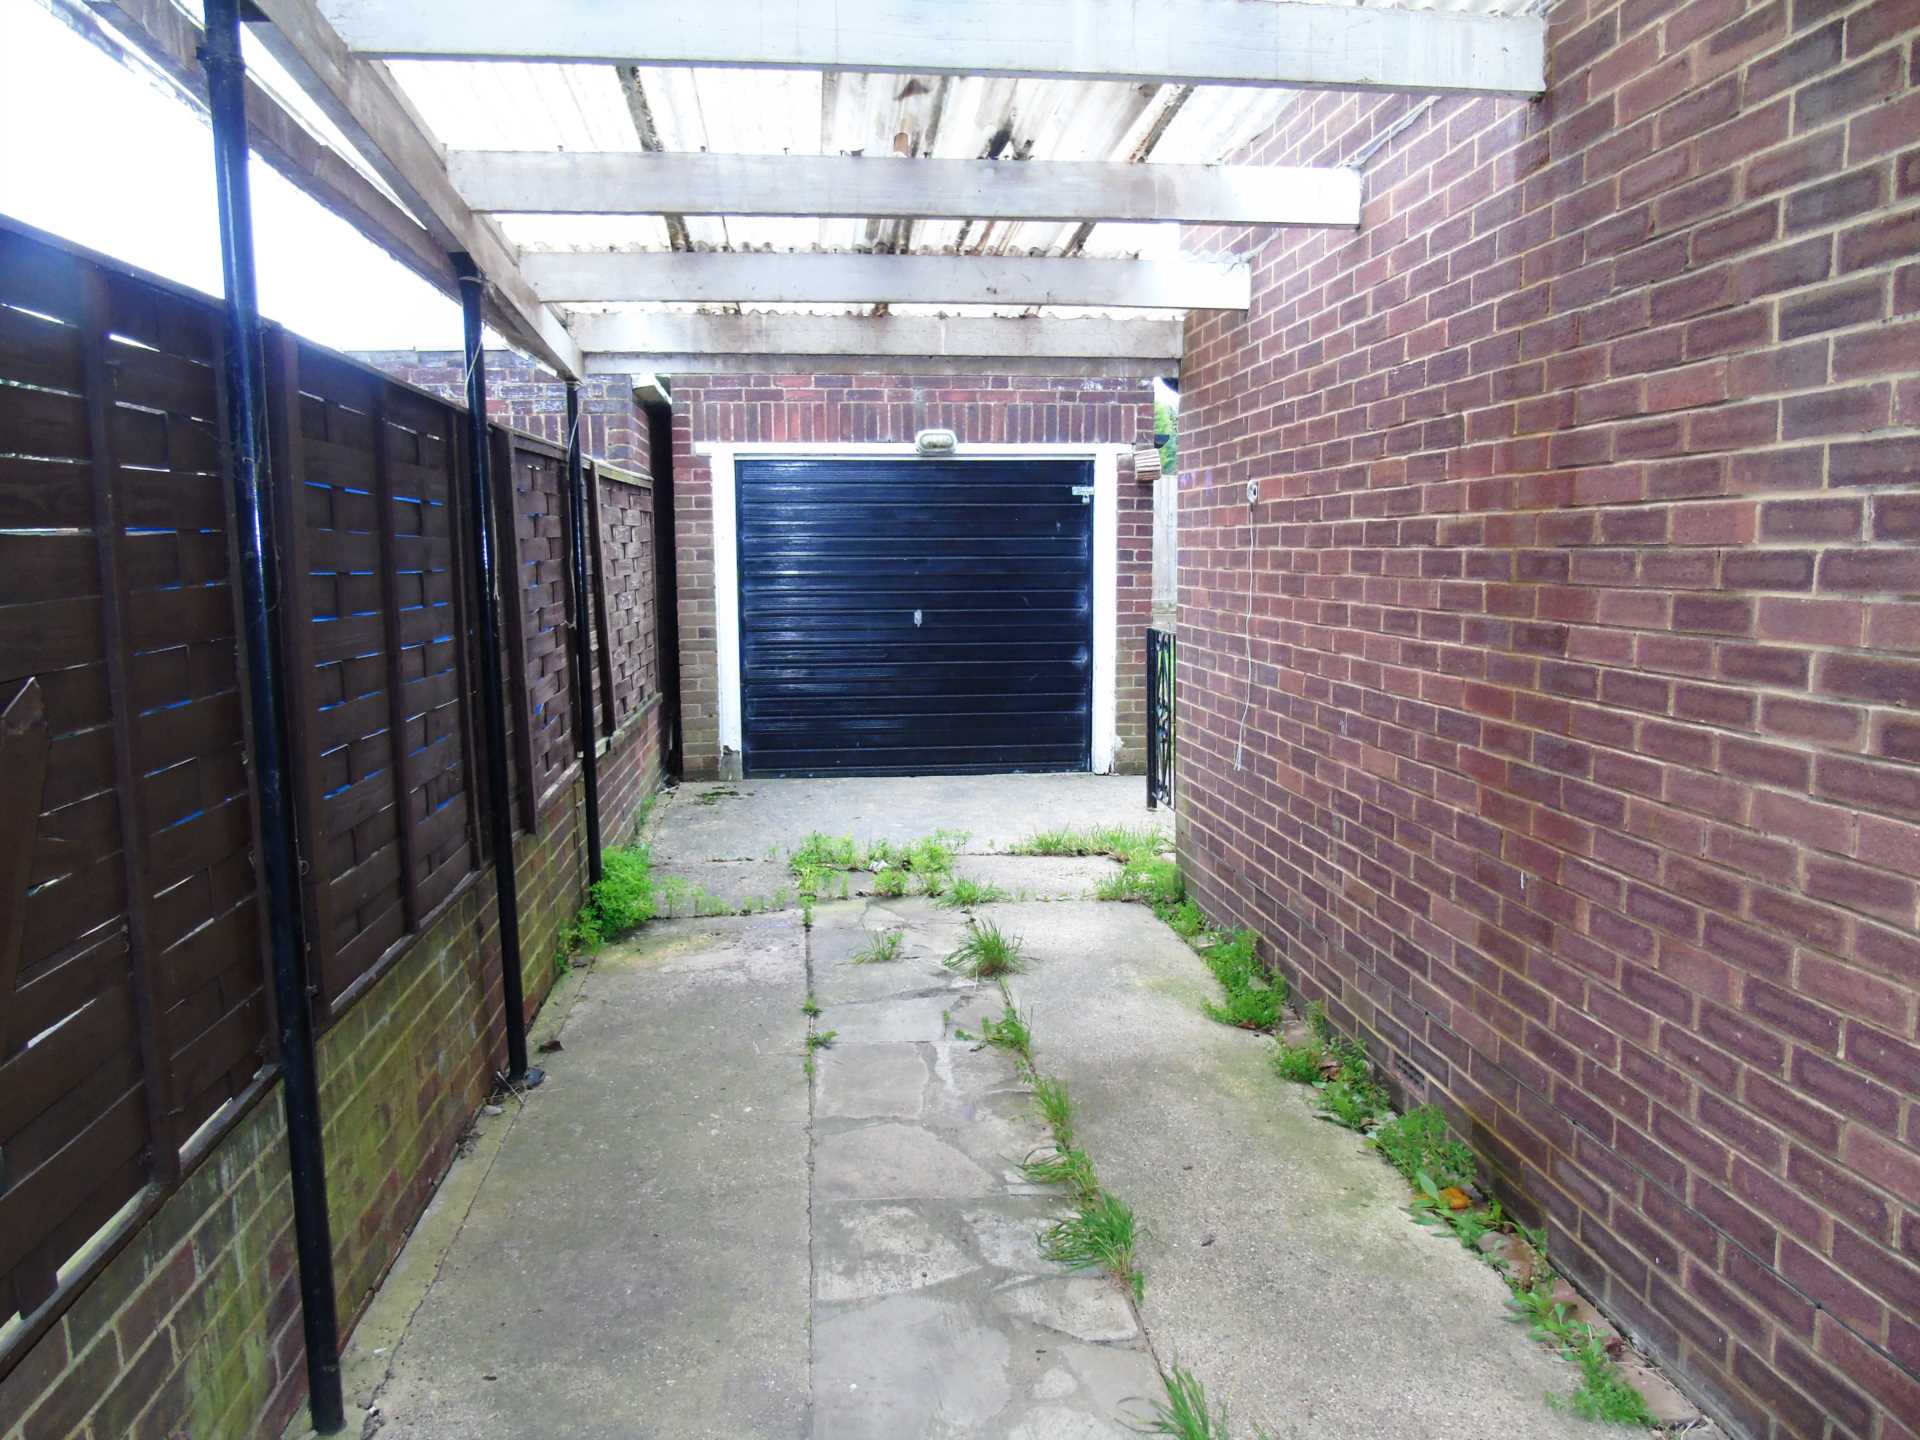 Staple Hall Road, Fenny Stratford, Image 11